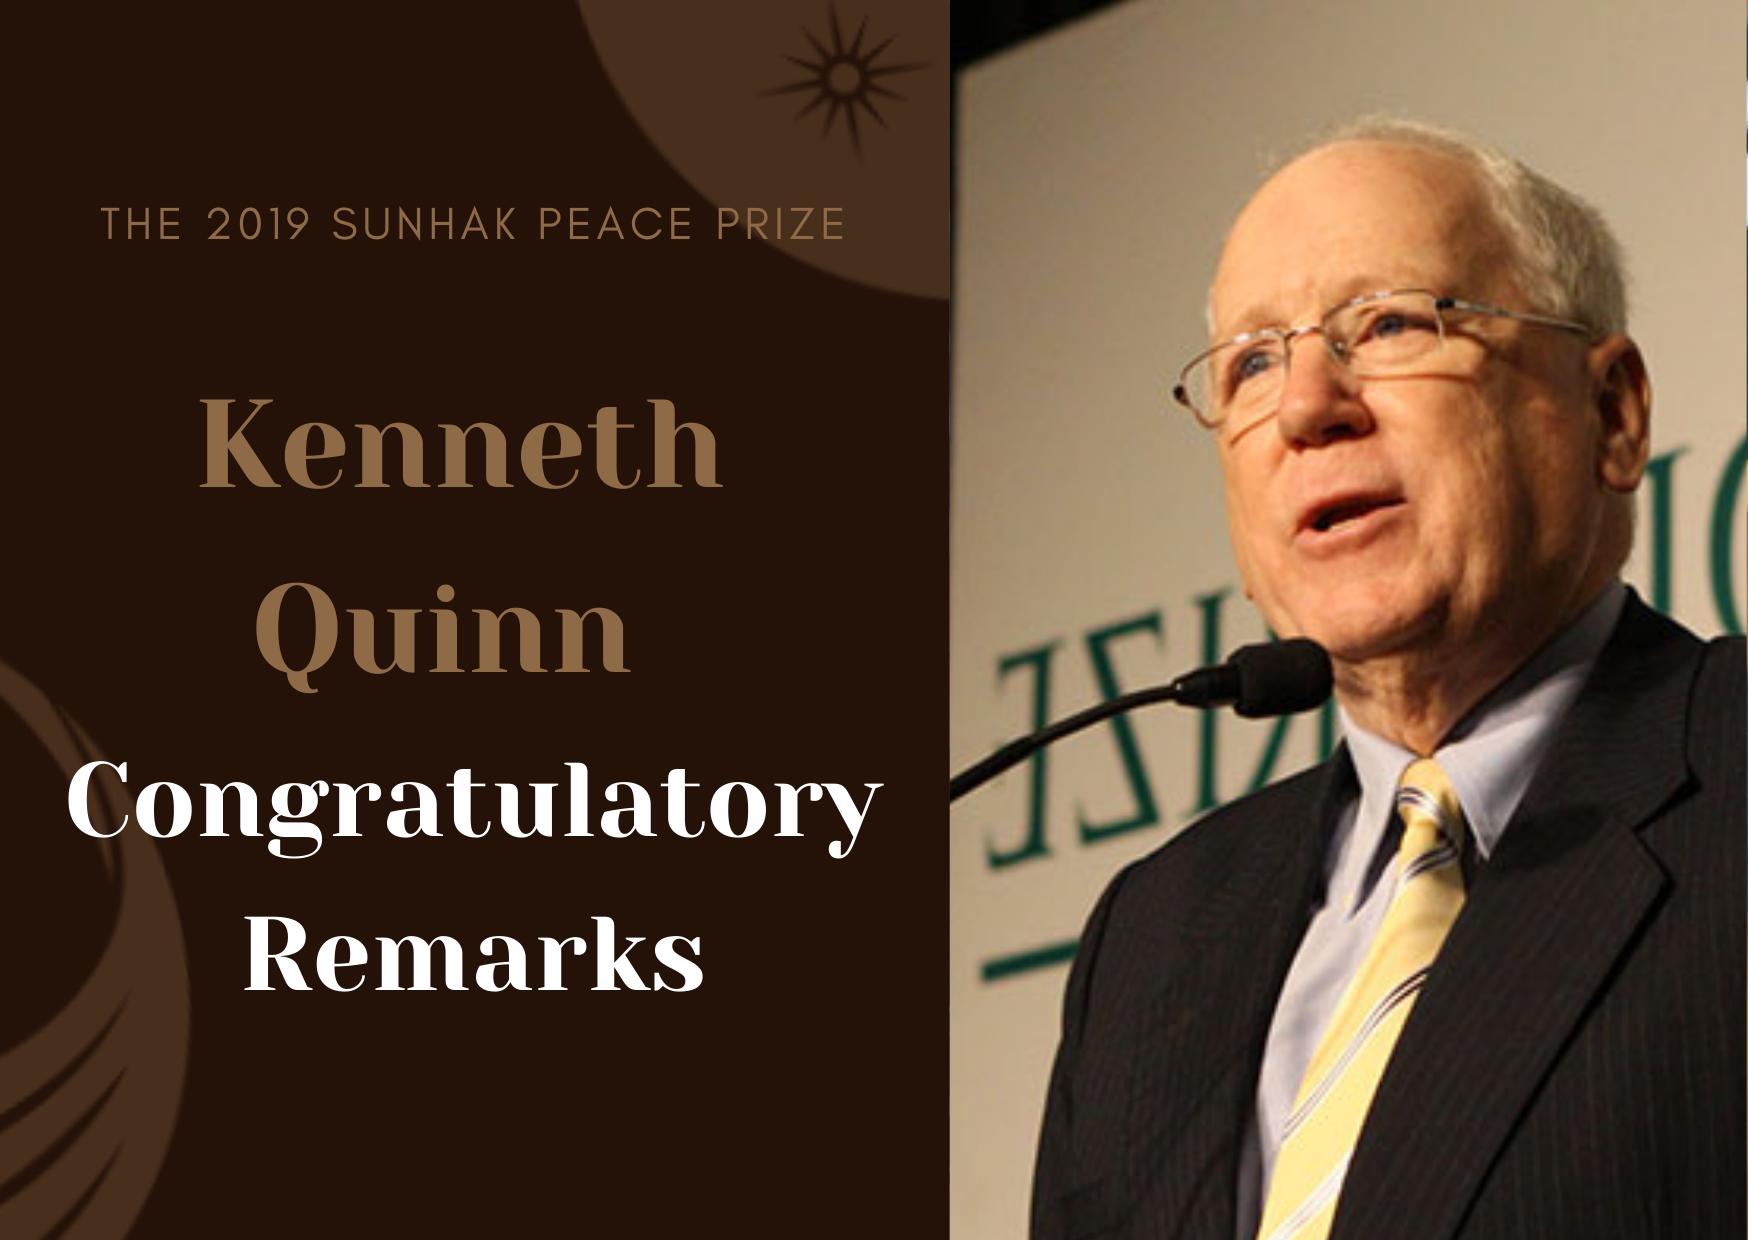 2019 Laureate Award Ceremony Congratulatory Remarks - Ambassador Kenneth Quinn 썸네일